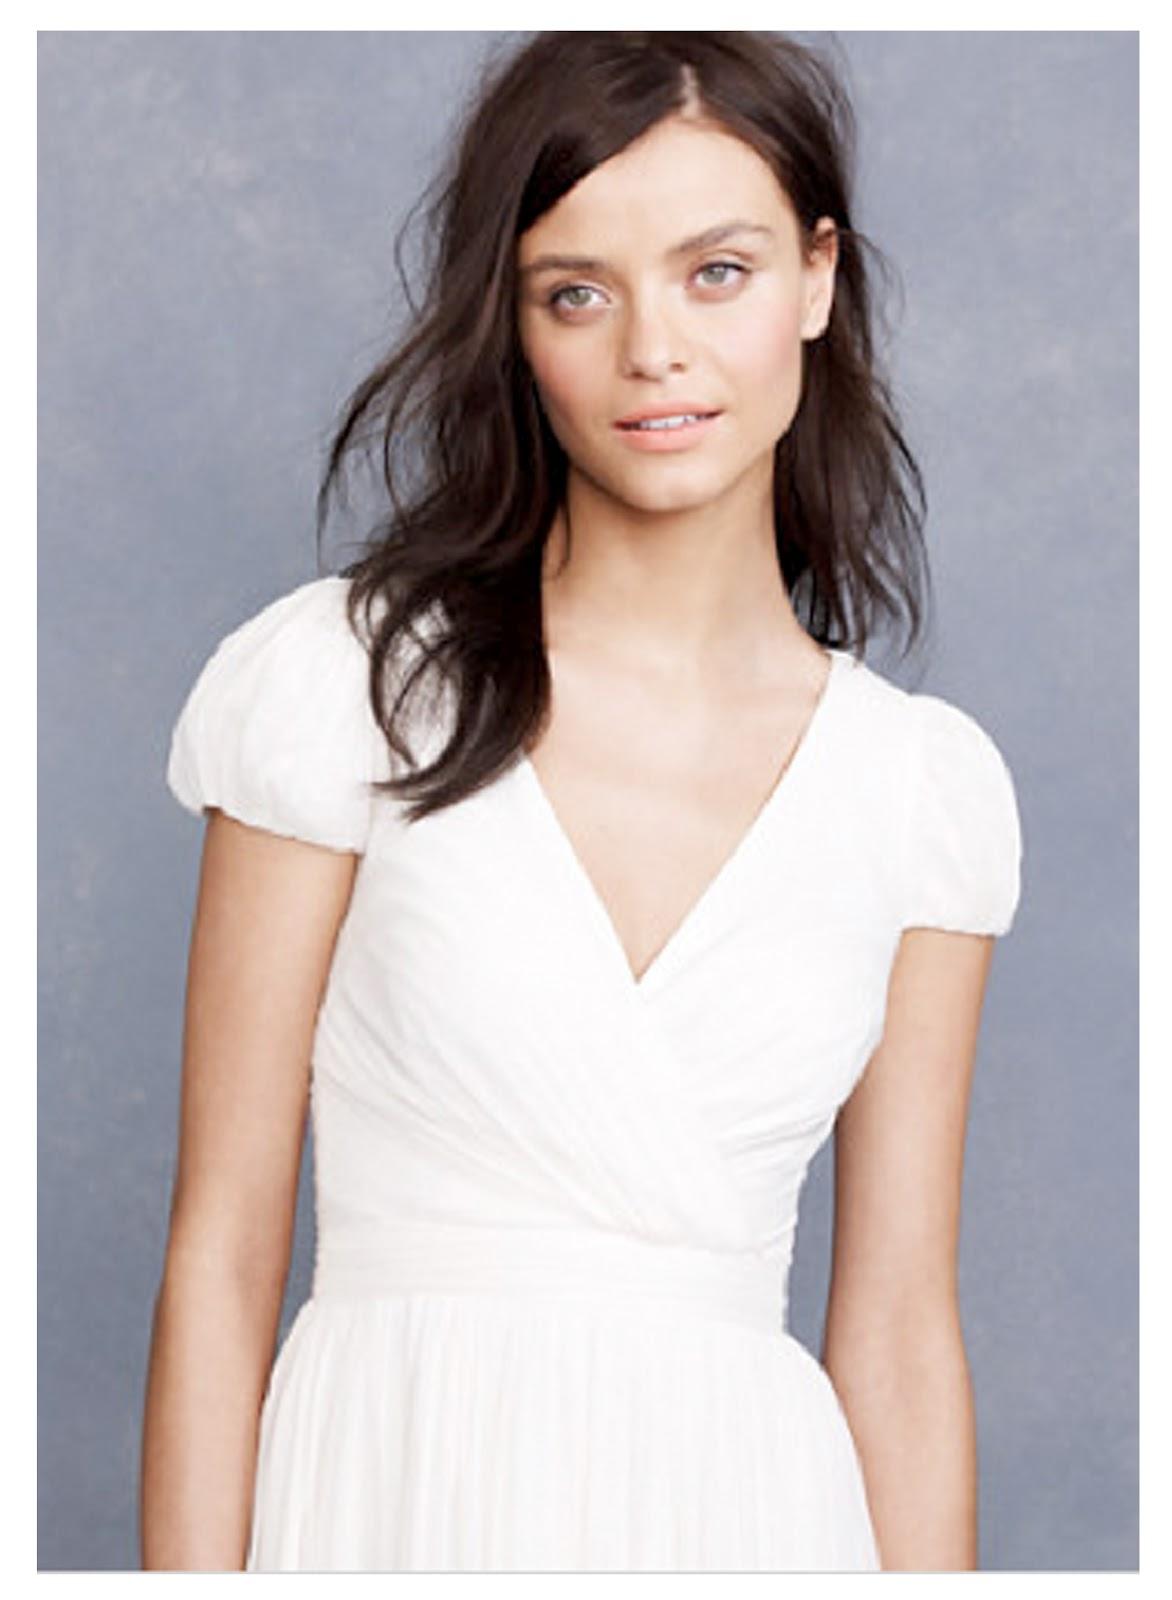 jcrew and modest beauty j crew wedding dress JCrew and Modest Beauty With Princess Kate s wedding dress